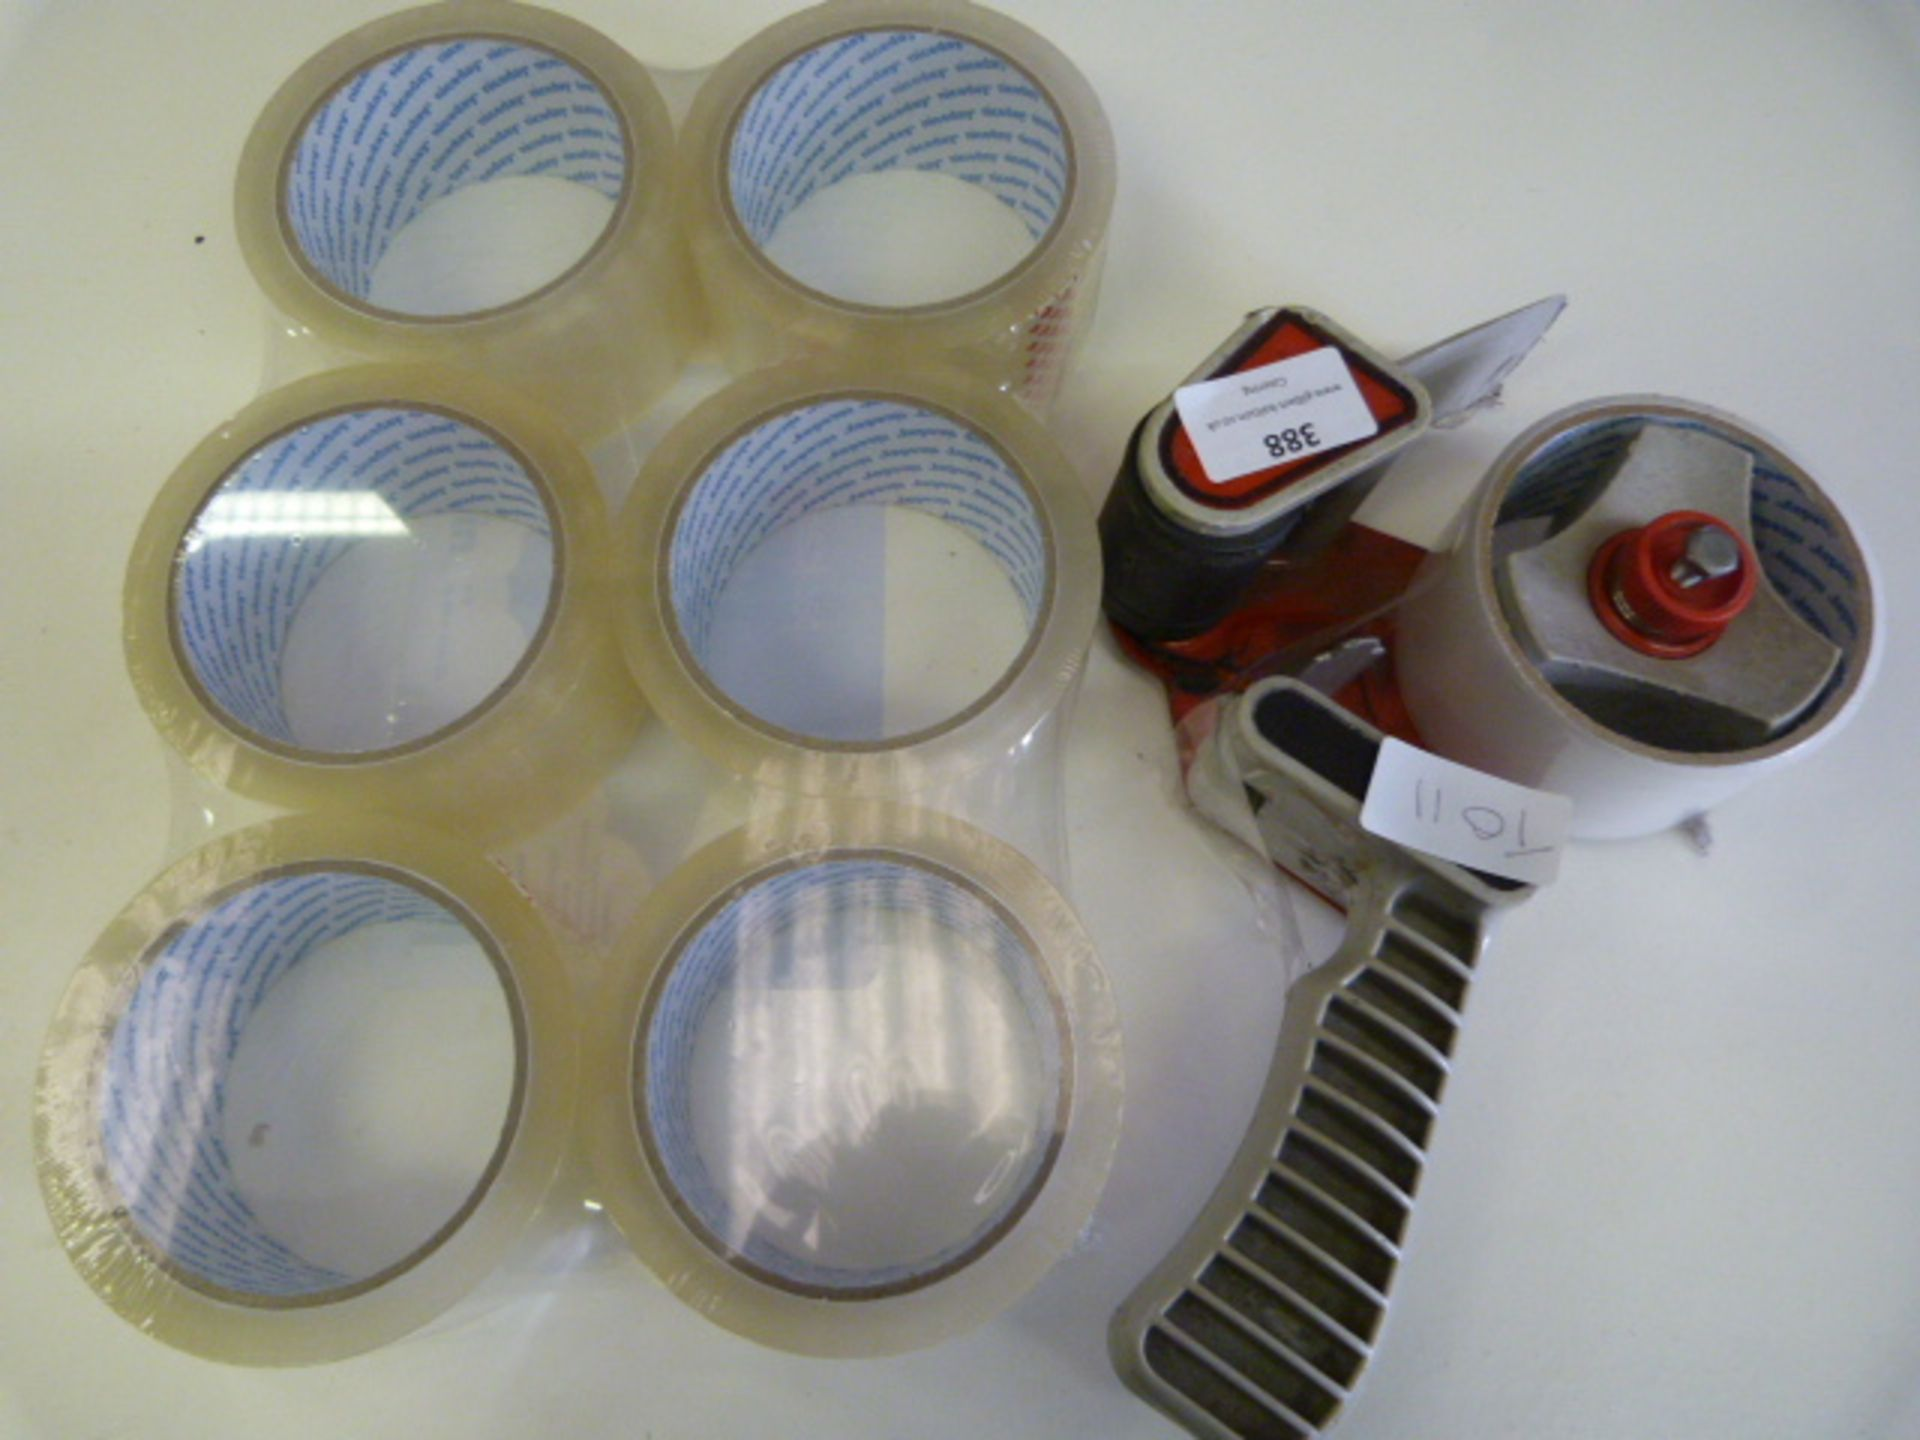 Lot 388 - Sellotape Dispenser and Six Rolls of Tape